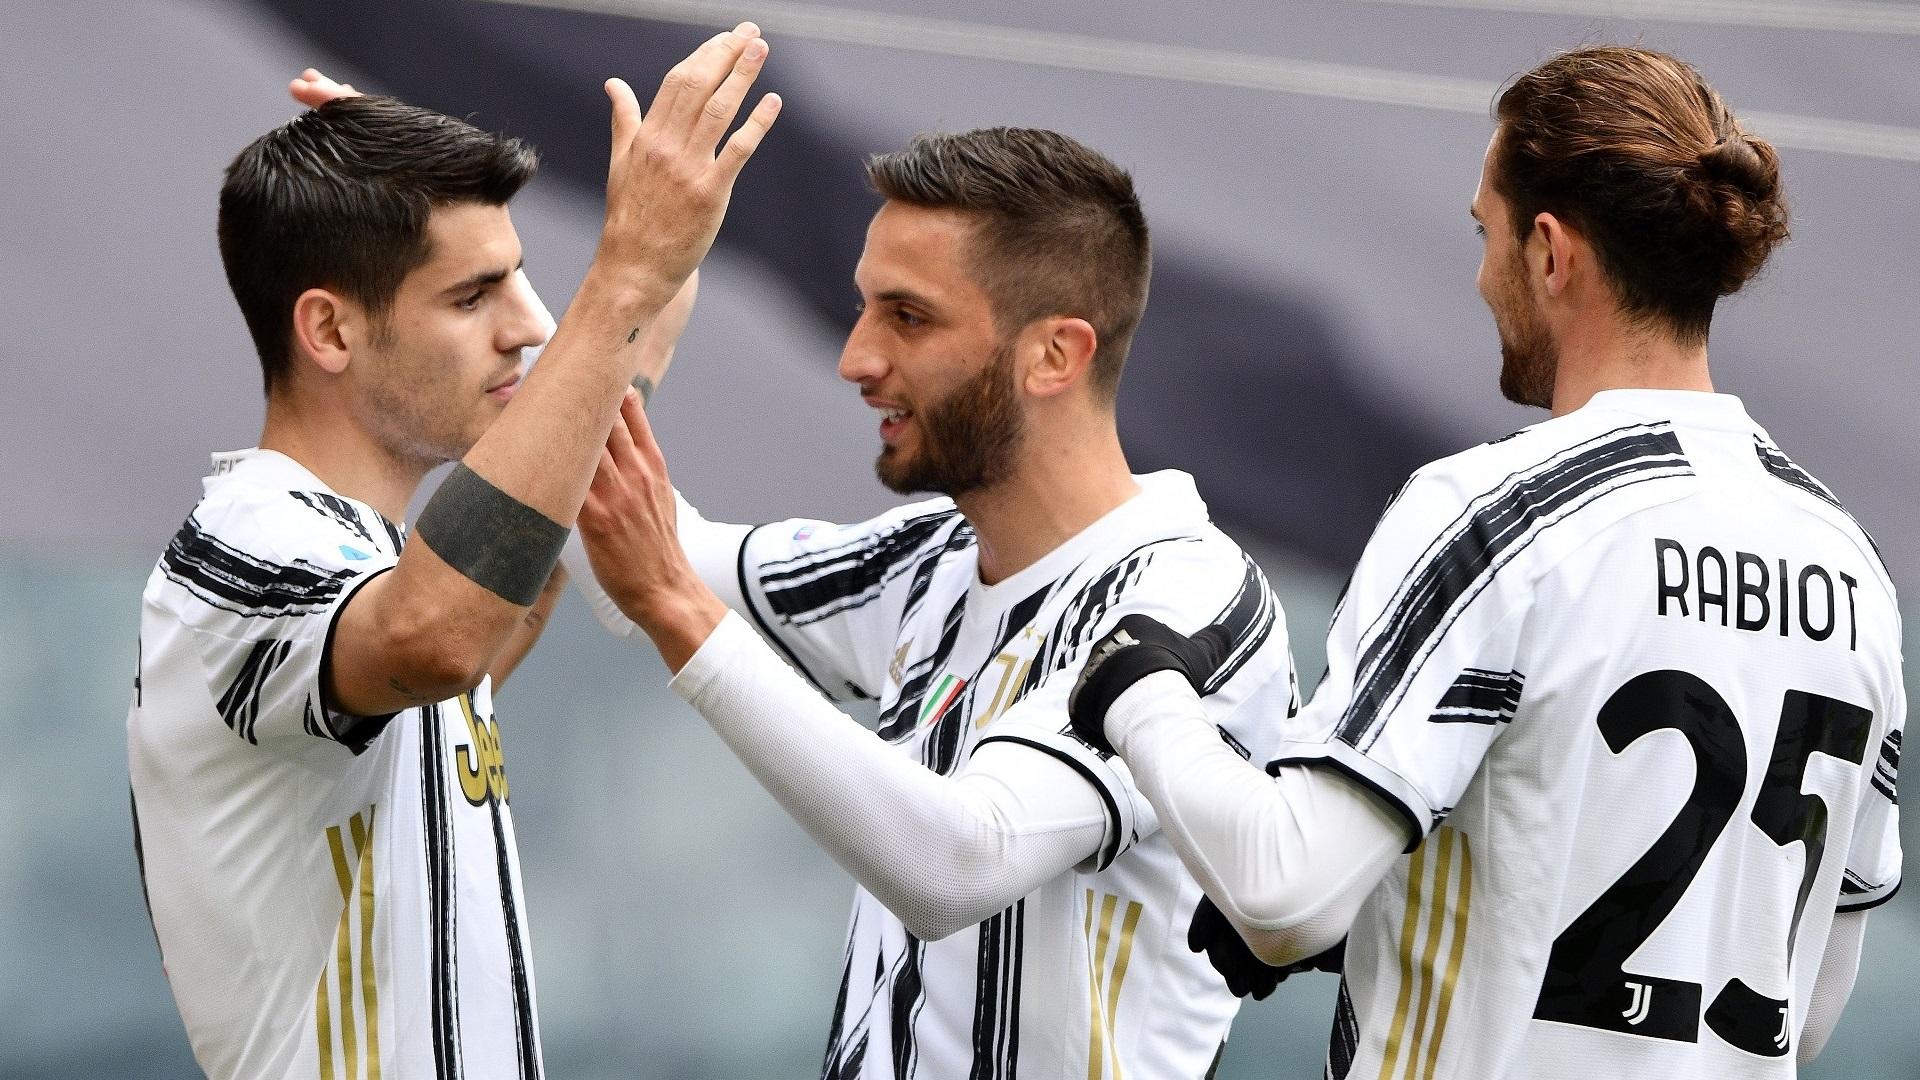 Serie A, Juventus-Genoa 3-1: le foto - Serie A, Juventus-Genoa 3-1: le foto  | Virgilio Sport